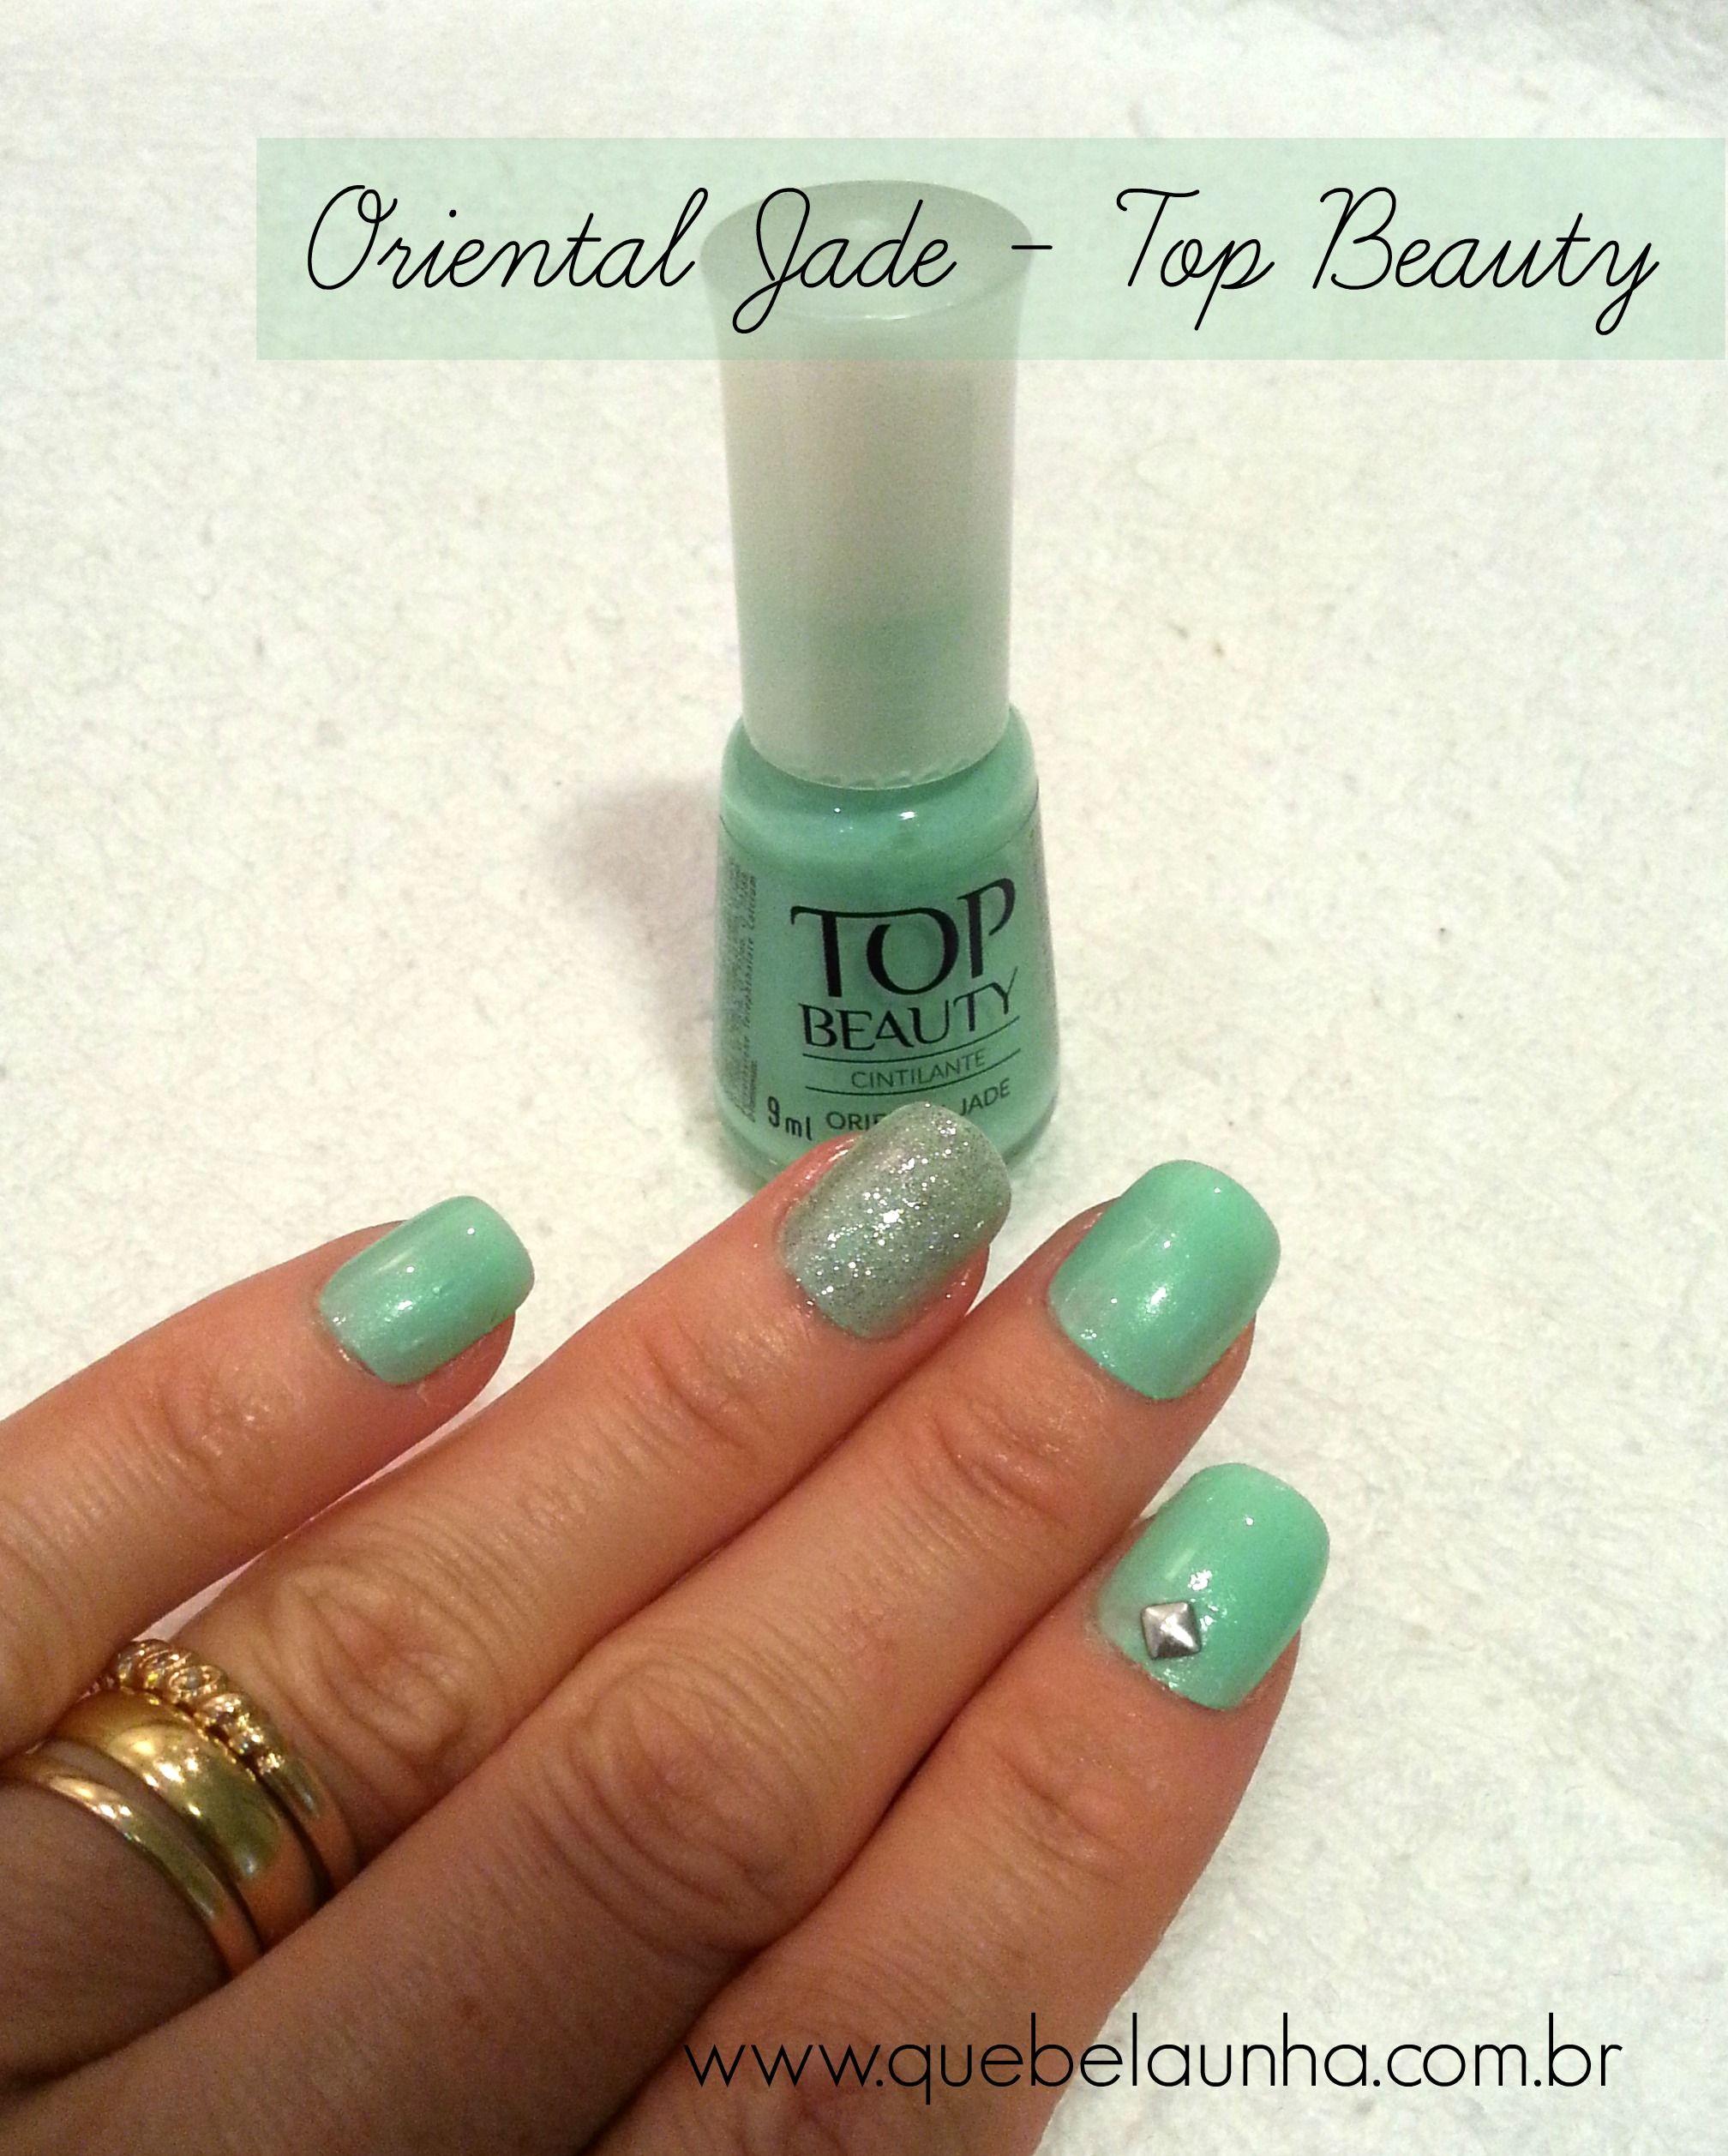 Oriental Jade da Top Beauty + Glitters + Aplique Metálico quadrado.  Verde água maravilhoso.  #topbeauty #esmaltes #unhas #nailart